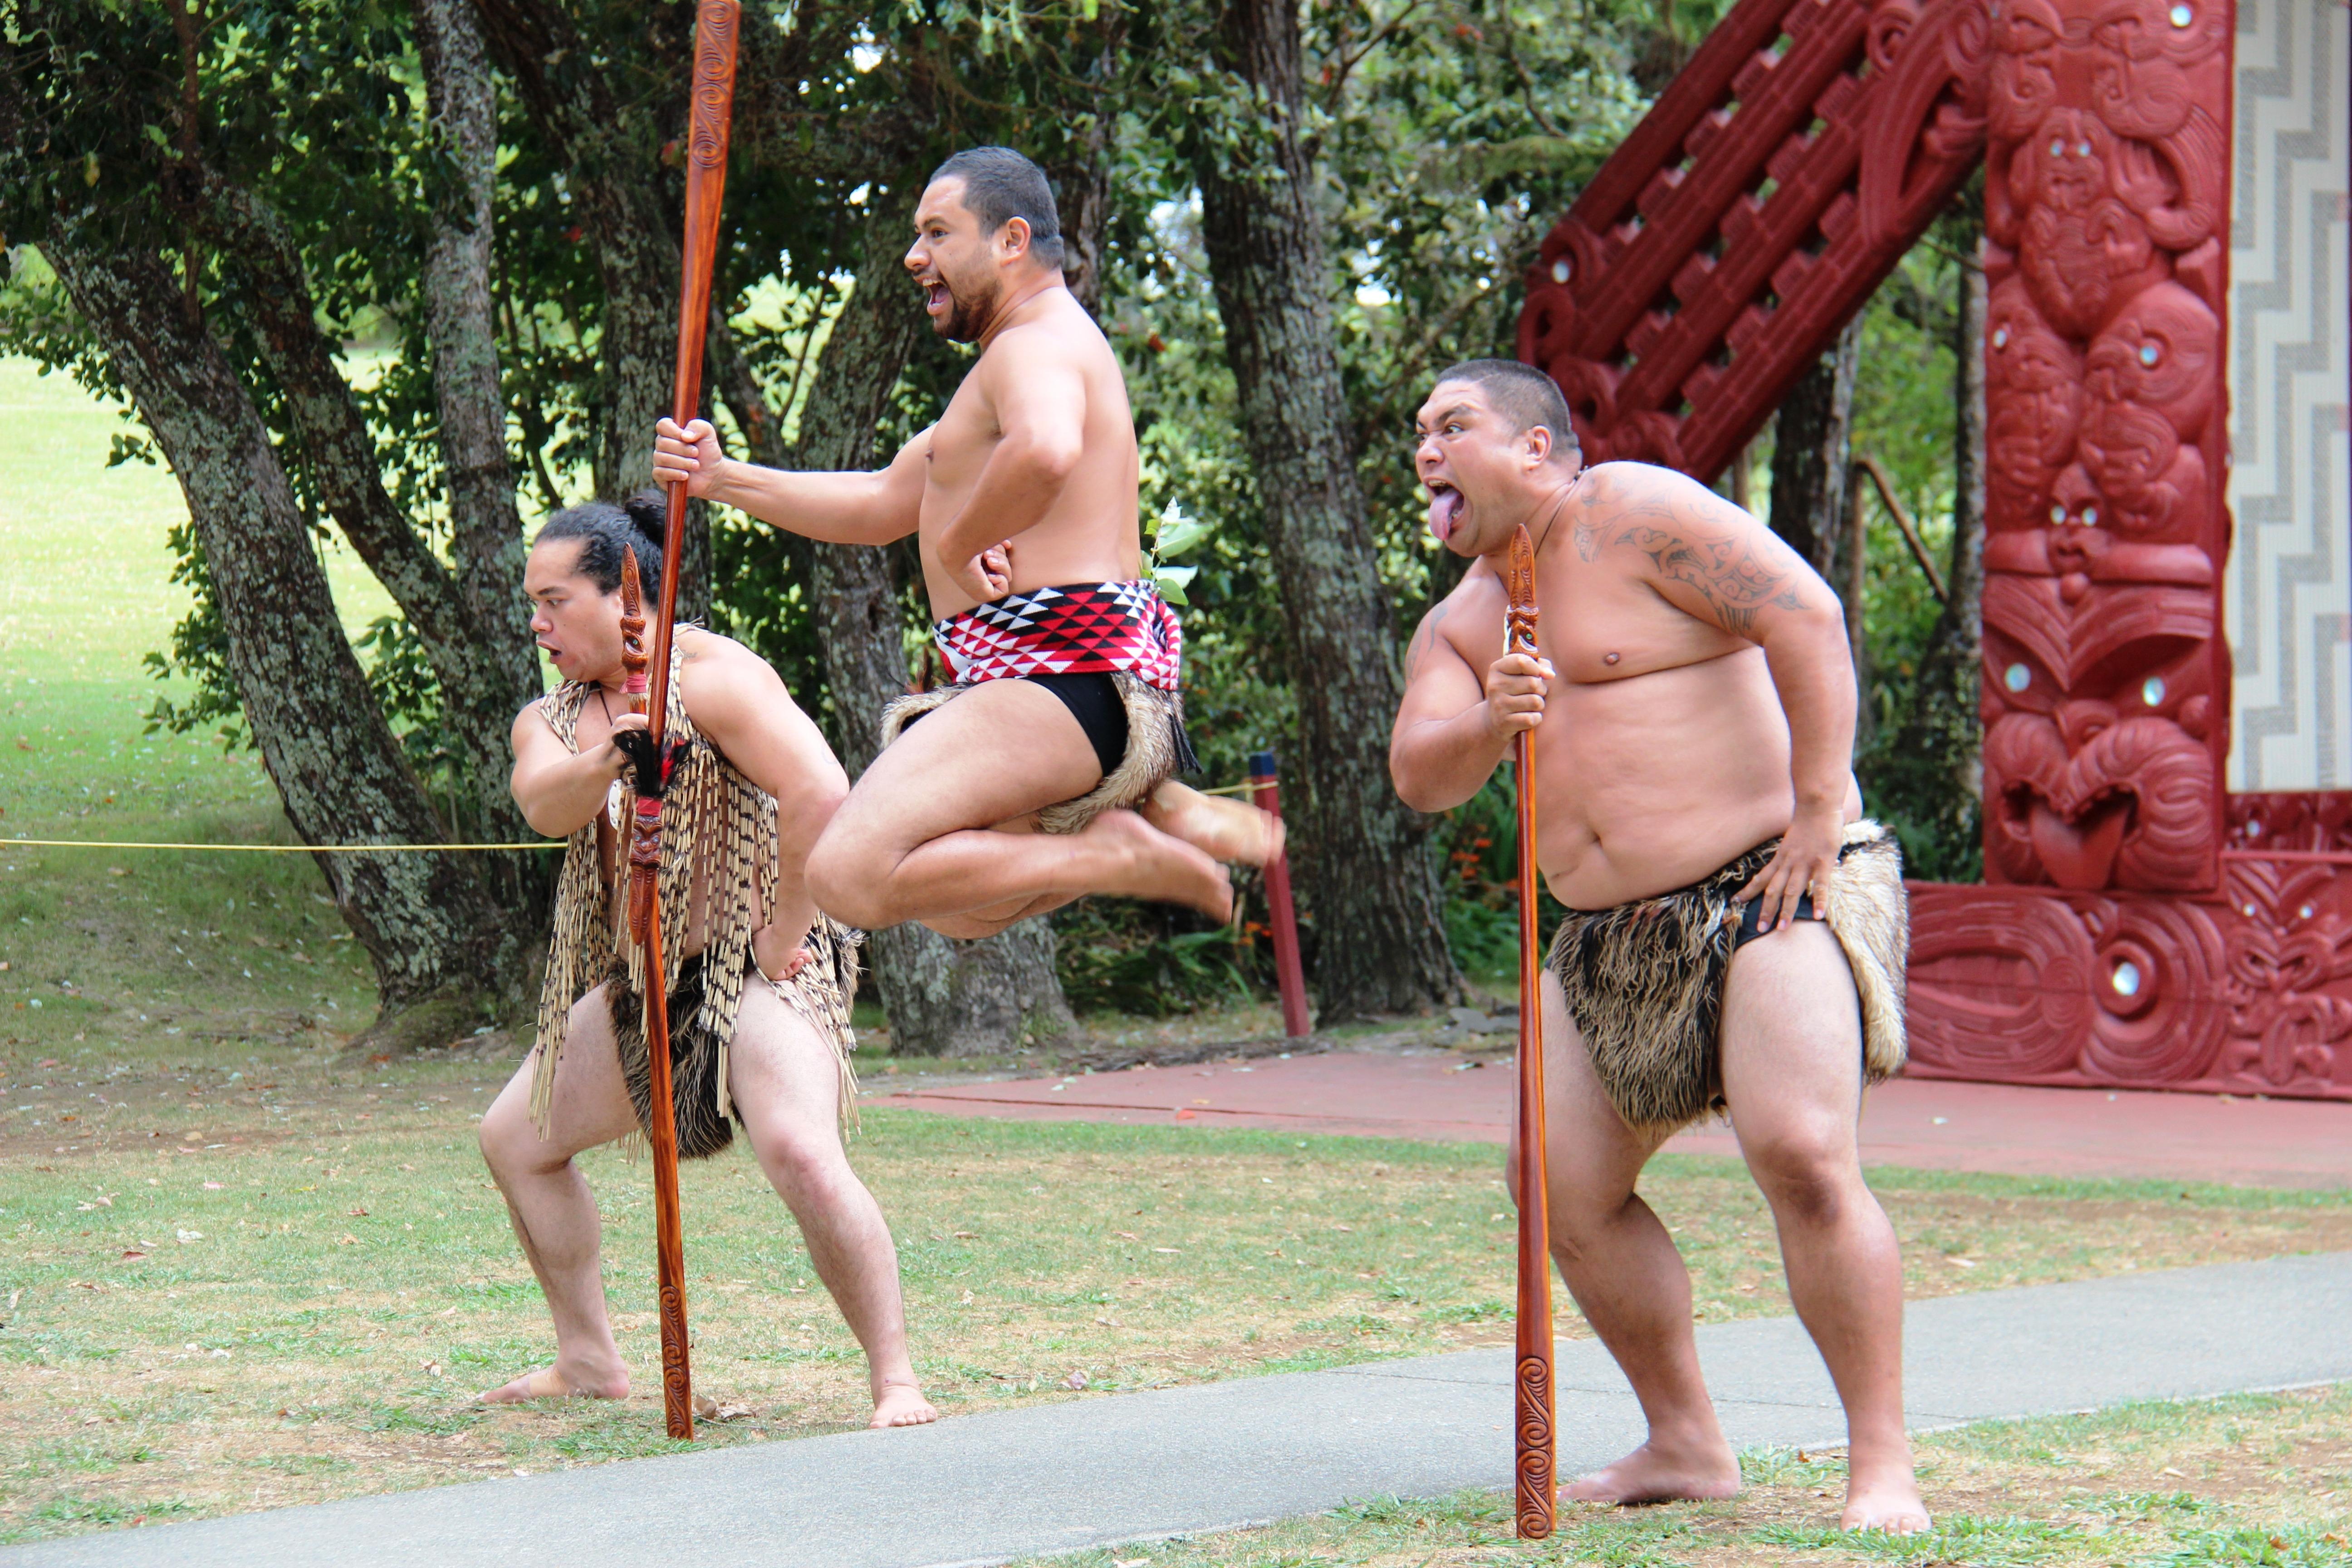 Amazing Maori Krieger Ideas Of Menschen Springen Kleidung Muskel Hop Männer Eeland